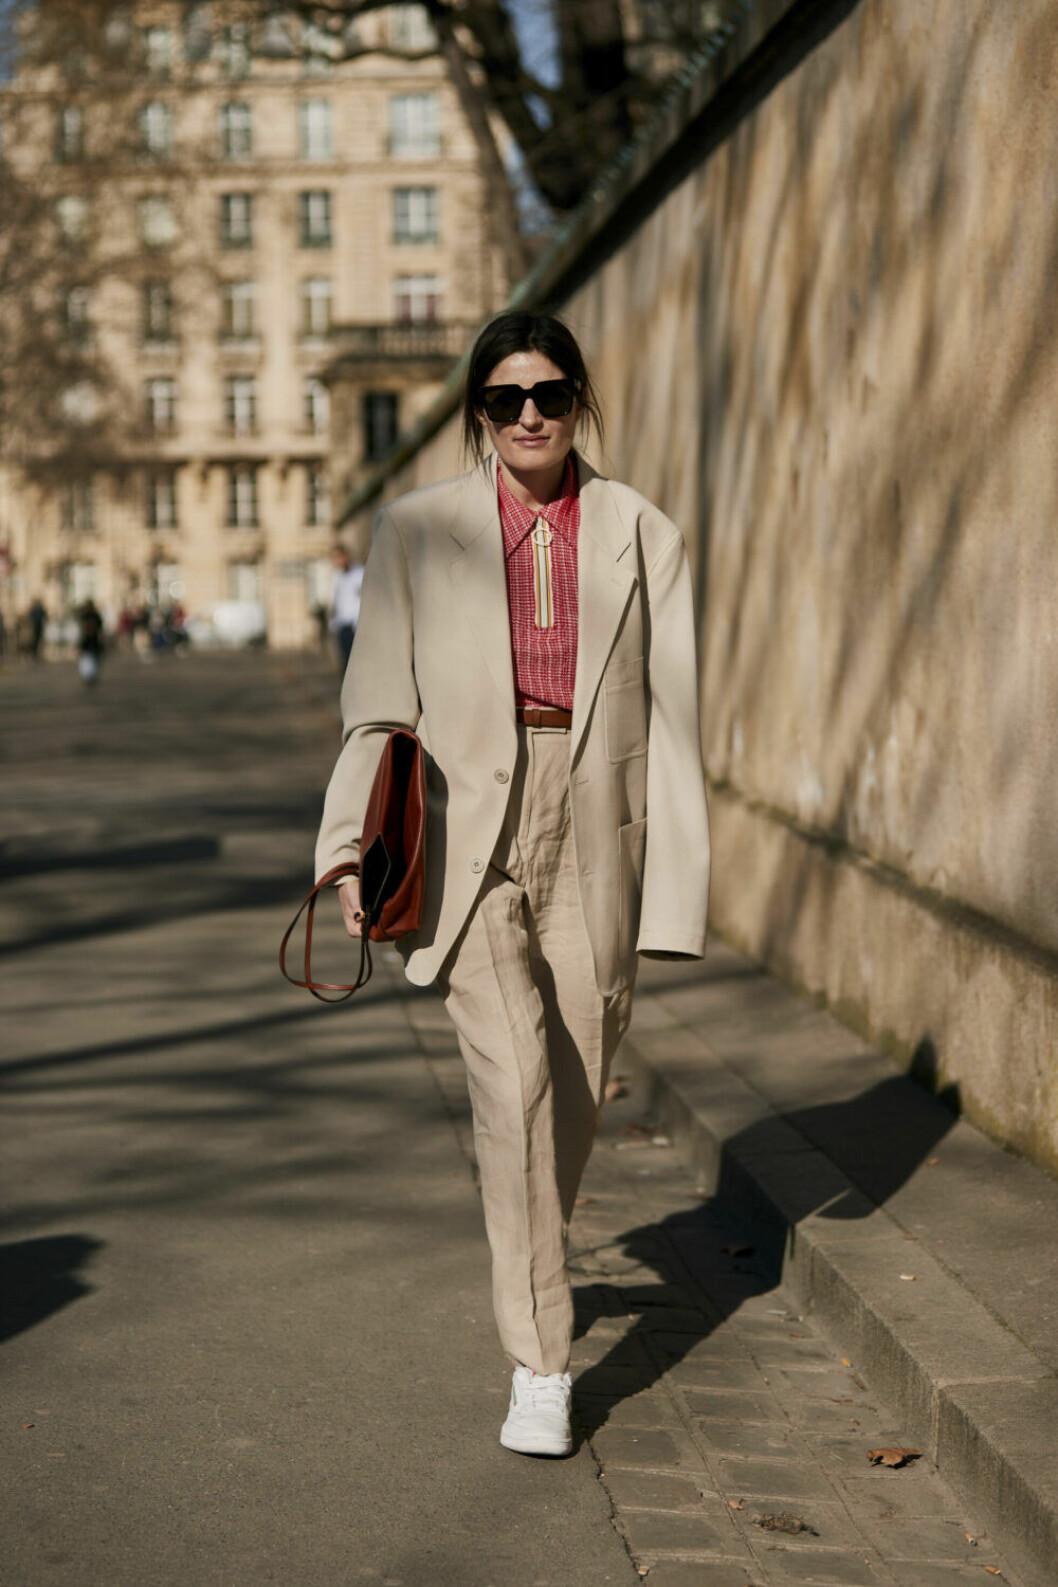 Streetstyle Paris FW, beige kostym och röd tröja.